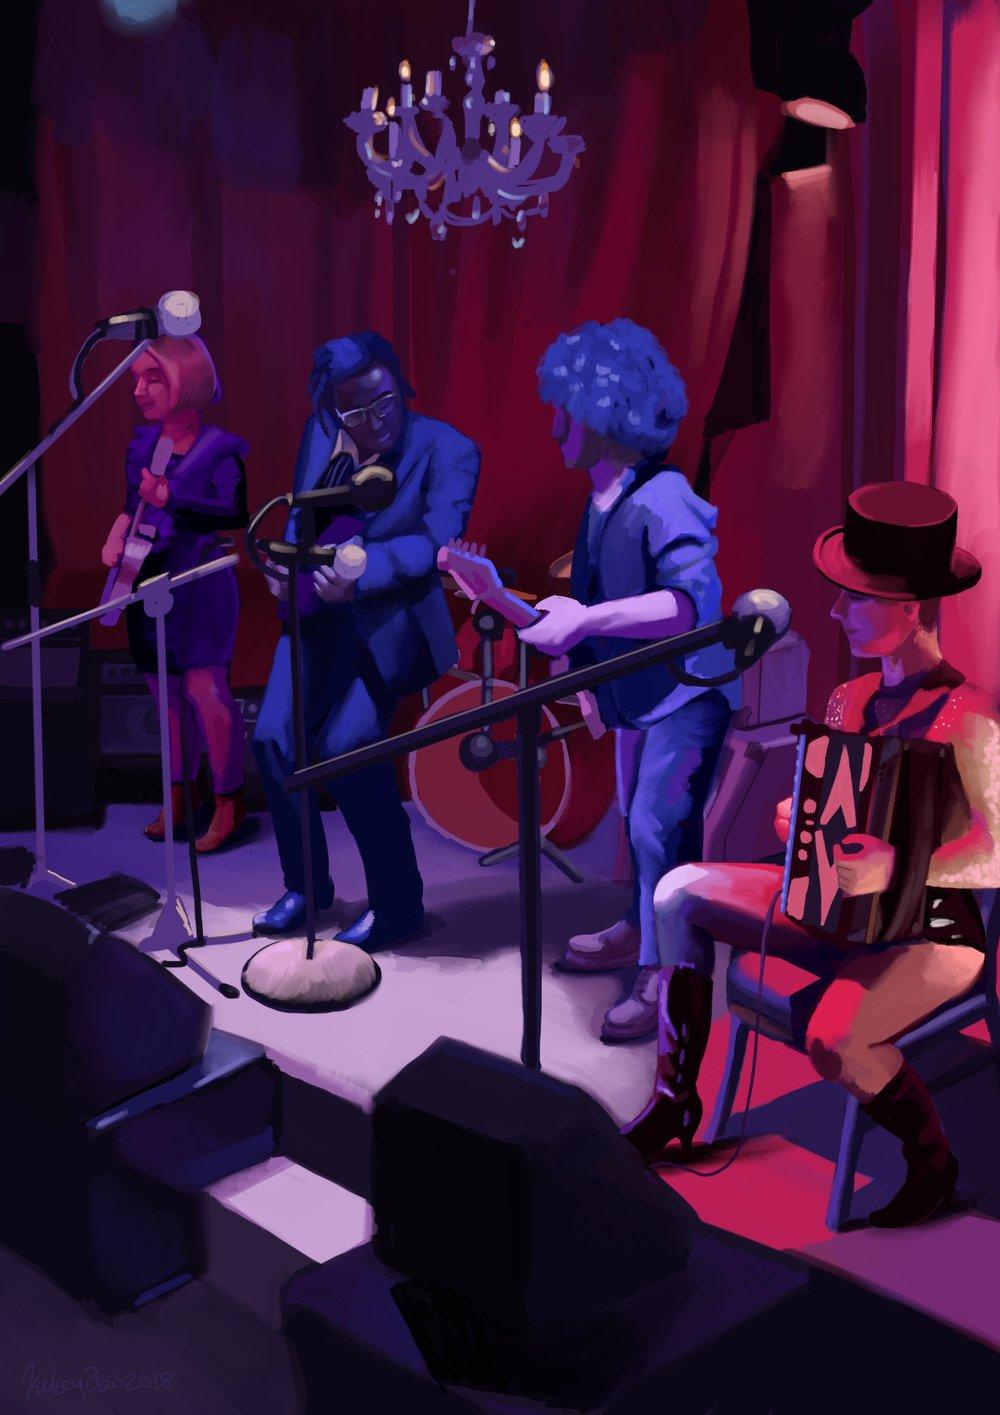 Tom_Petty_Concert3.jpg